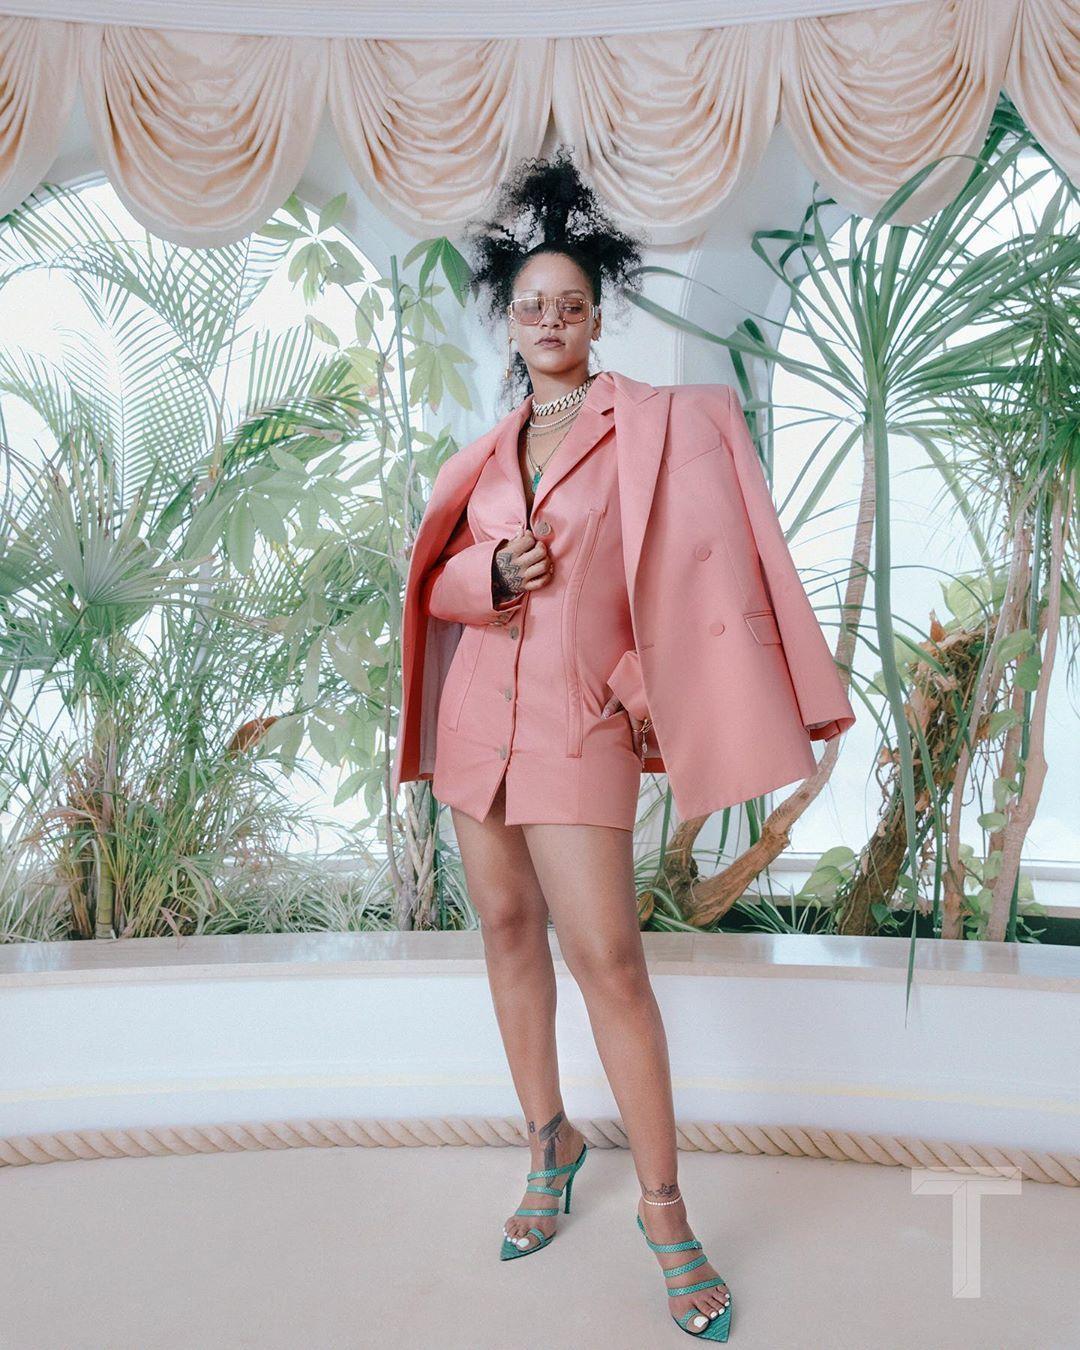 Rihanna Berikan Sneak Peek Soal Debut Koleksi Fenty Terbaru!